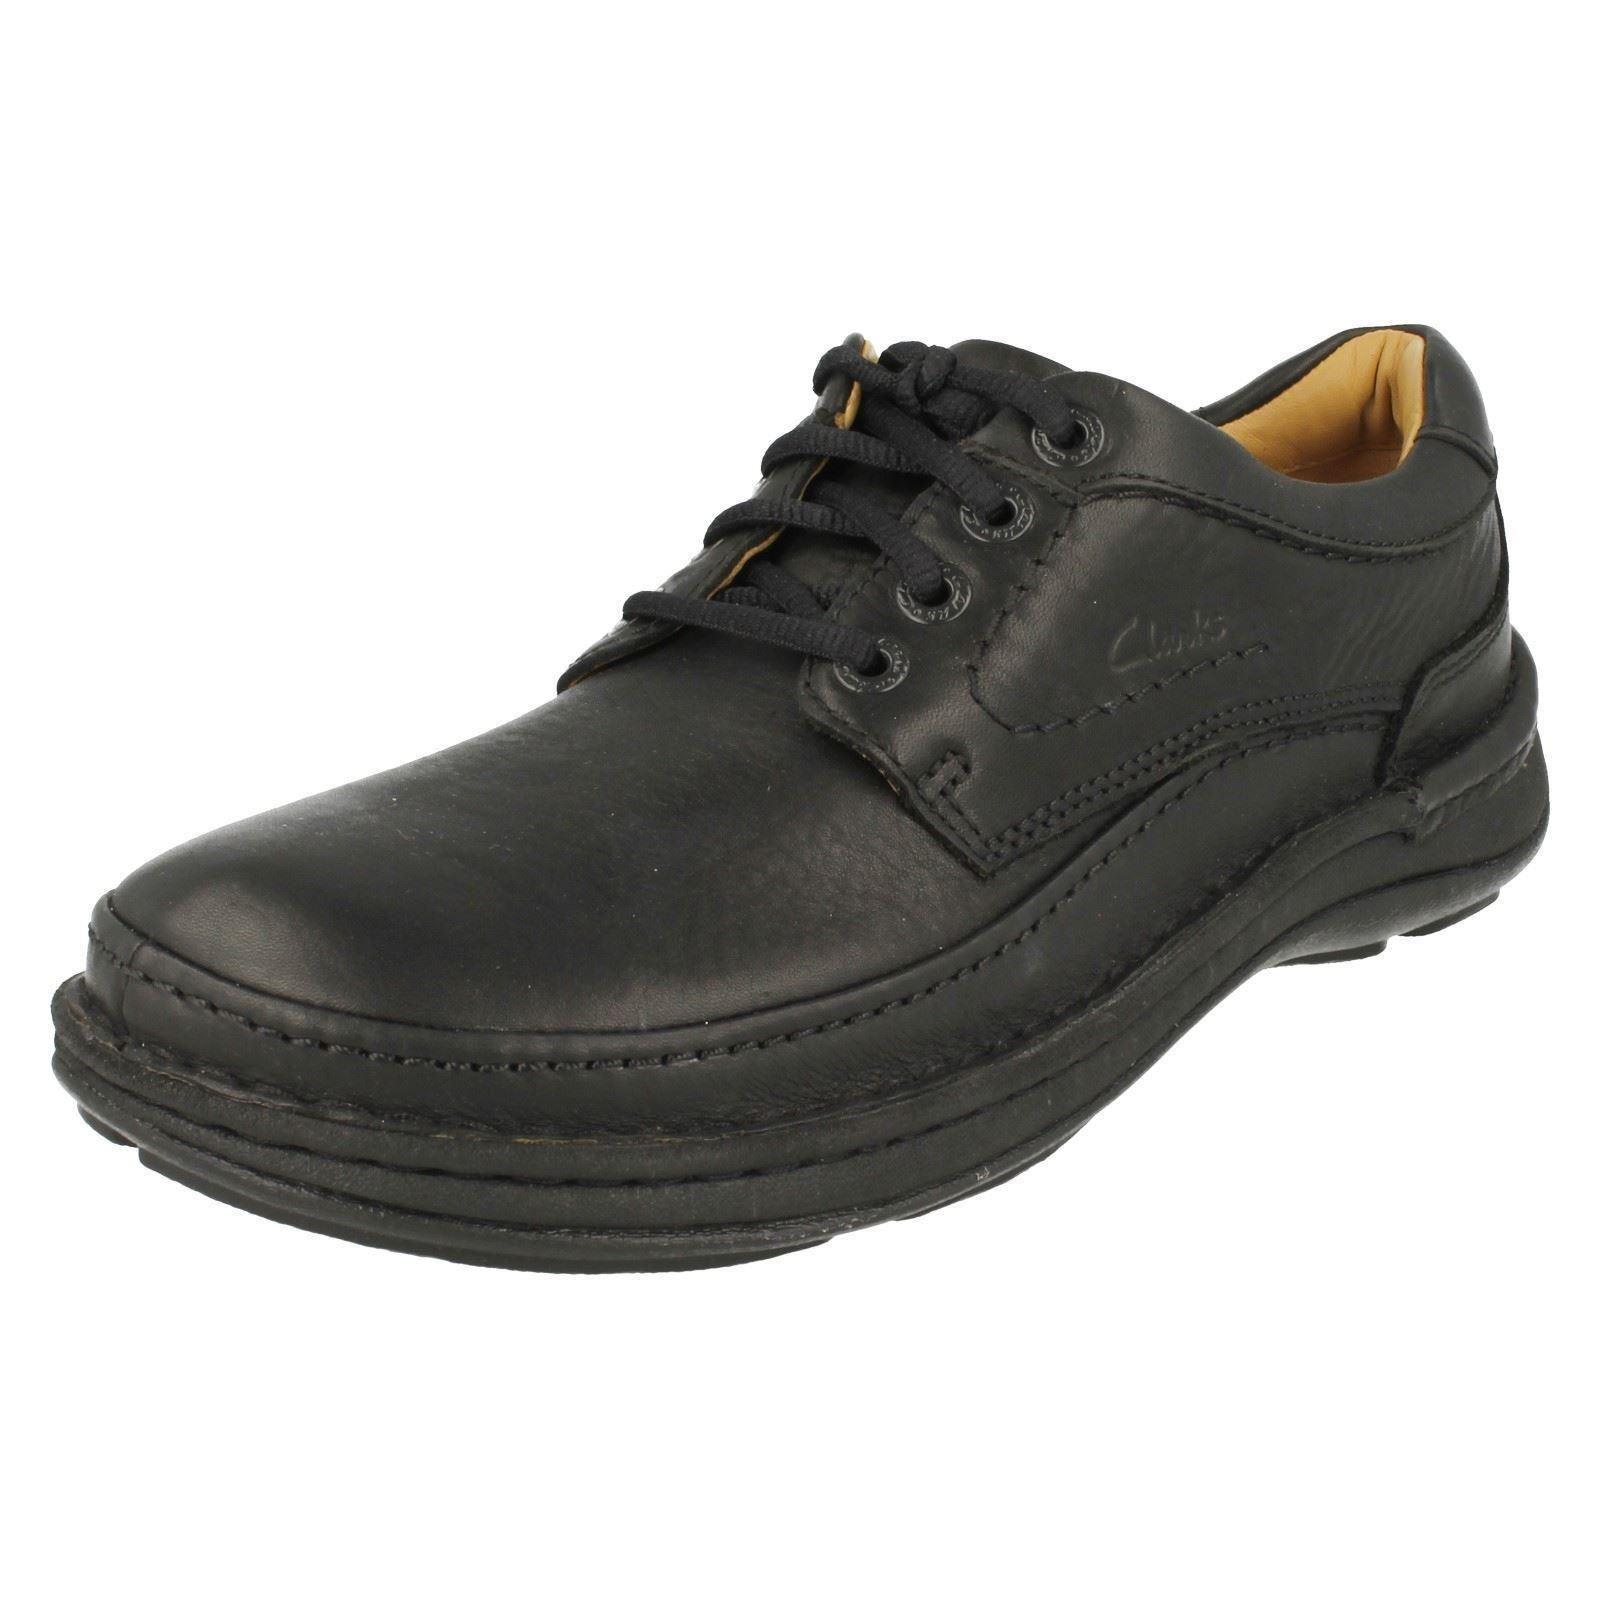 Clarks Air Soles Shoes